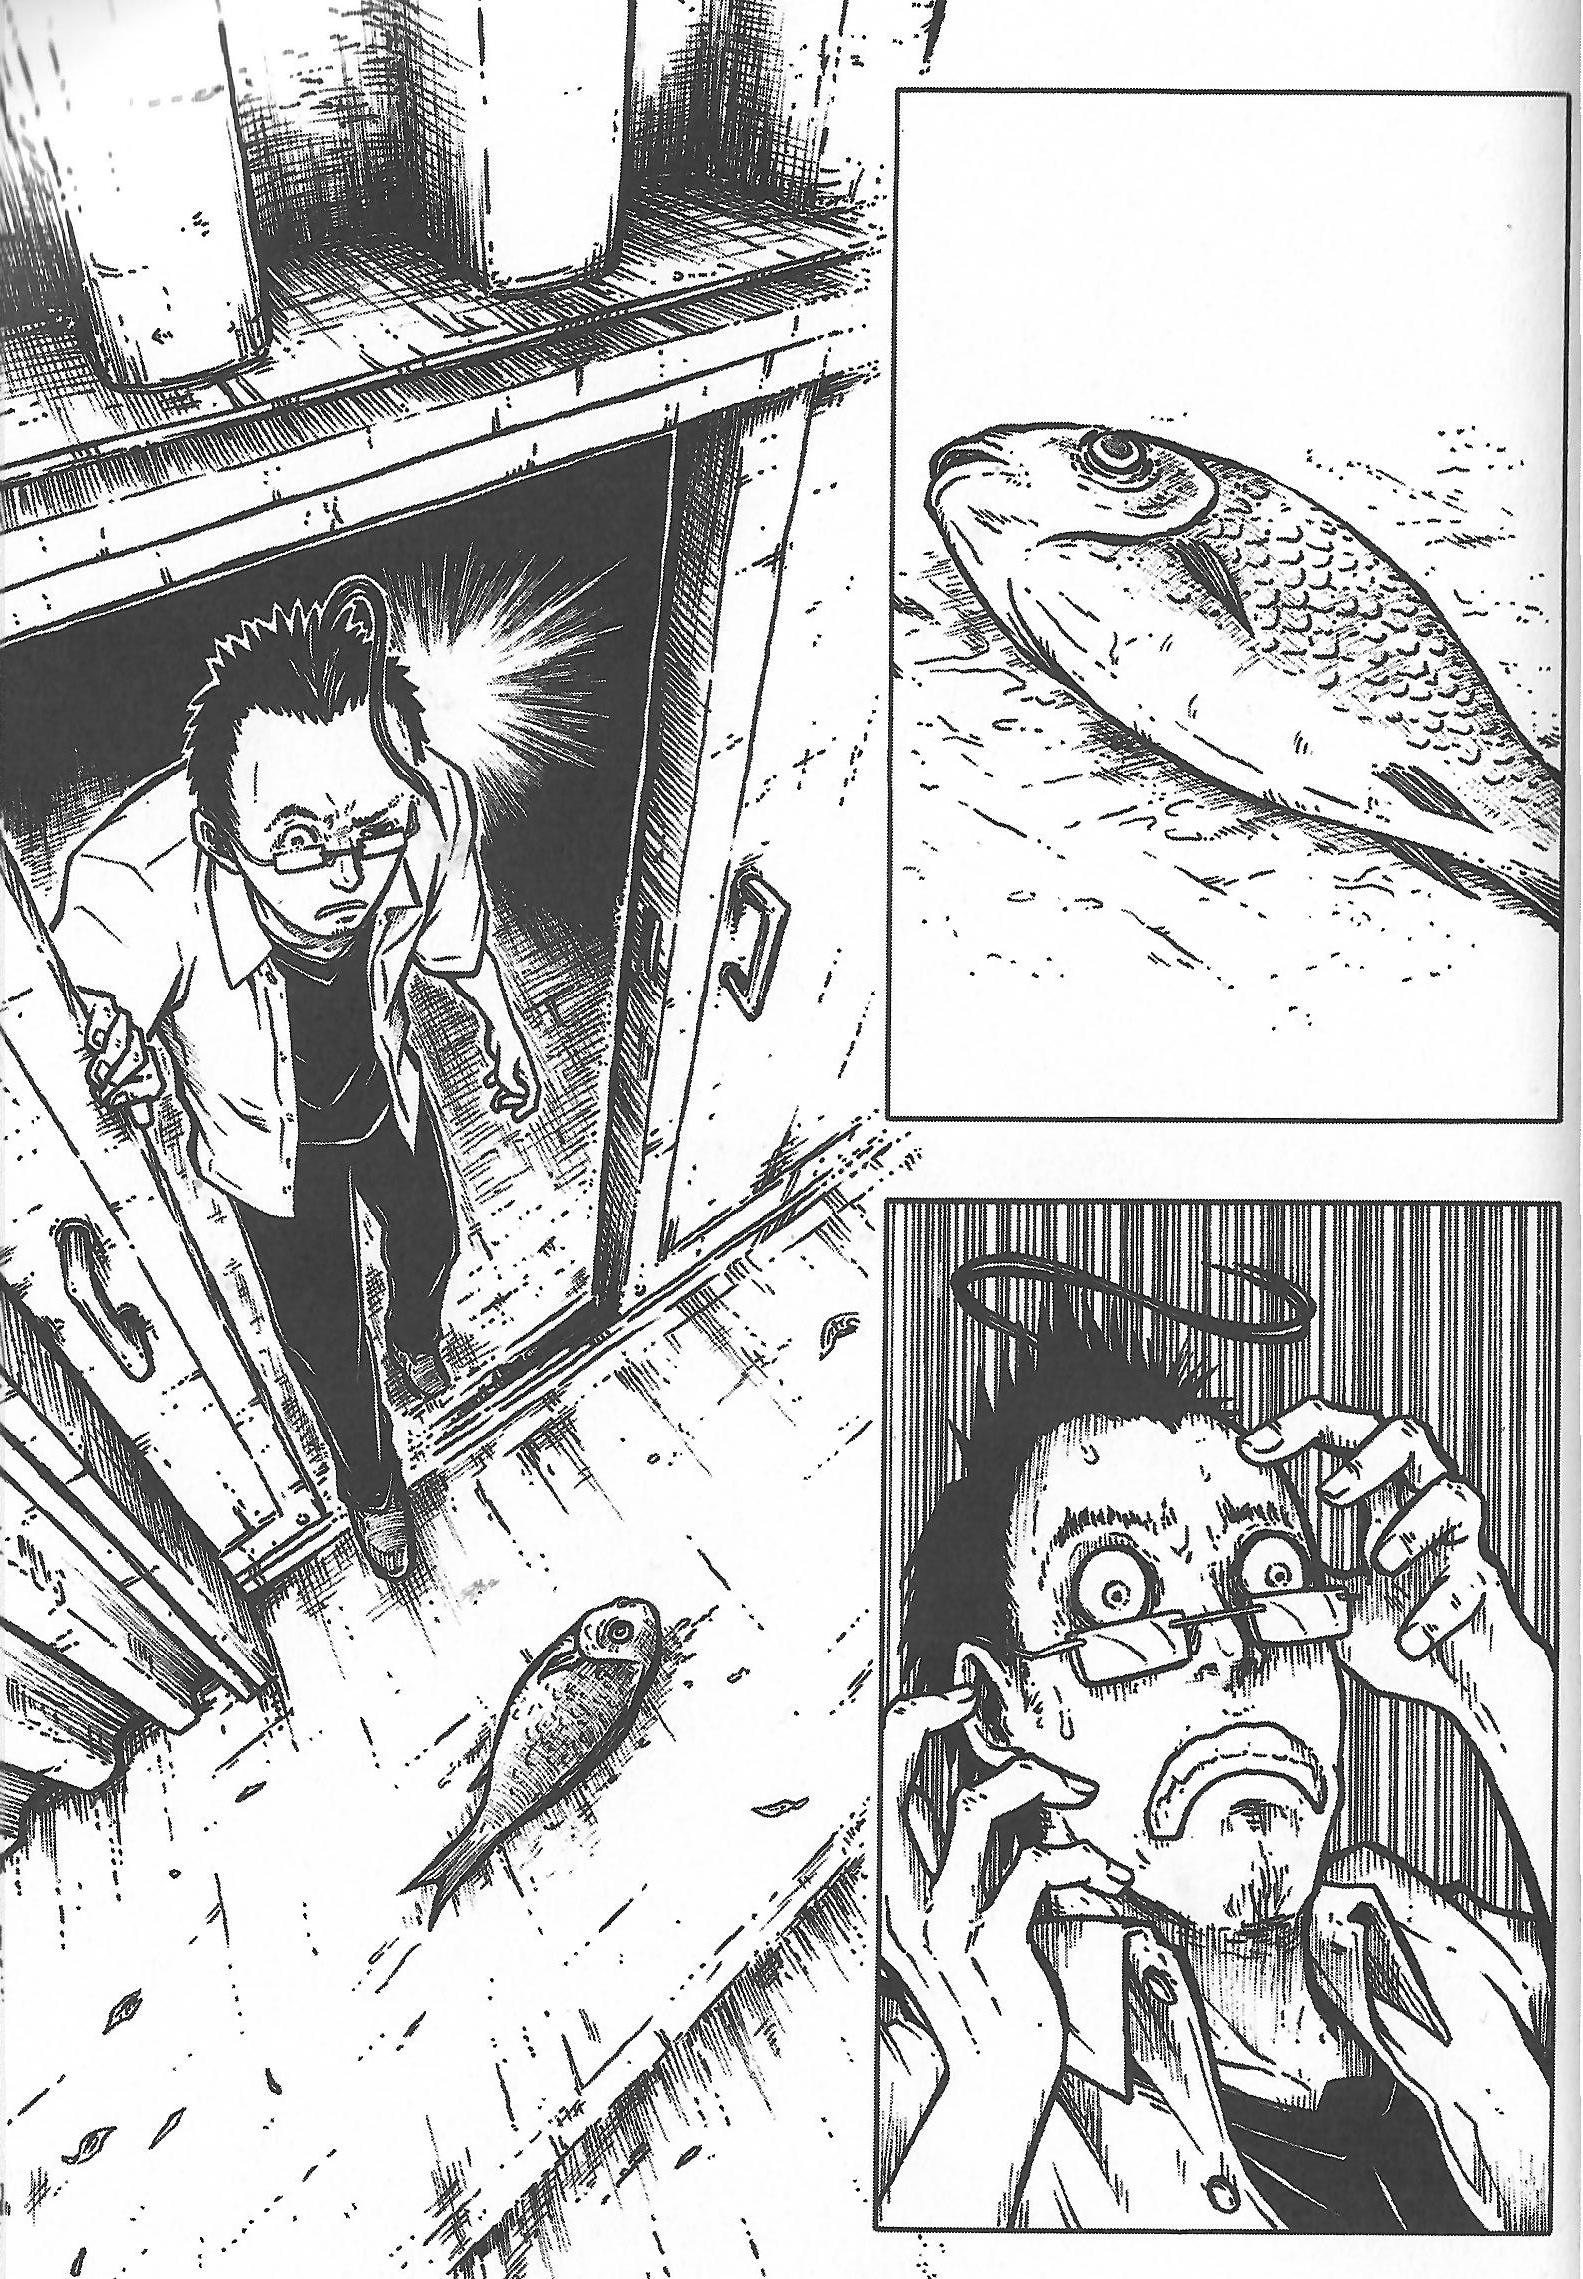 Ichthyophobia-peur